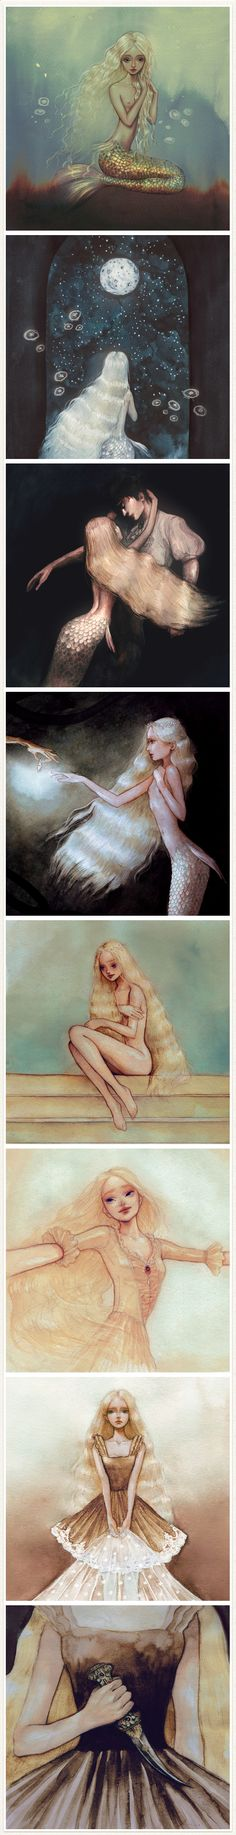 """The Little Mermaid"" illustrated by Kata Kiss"